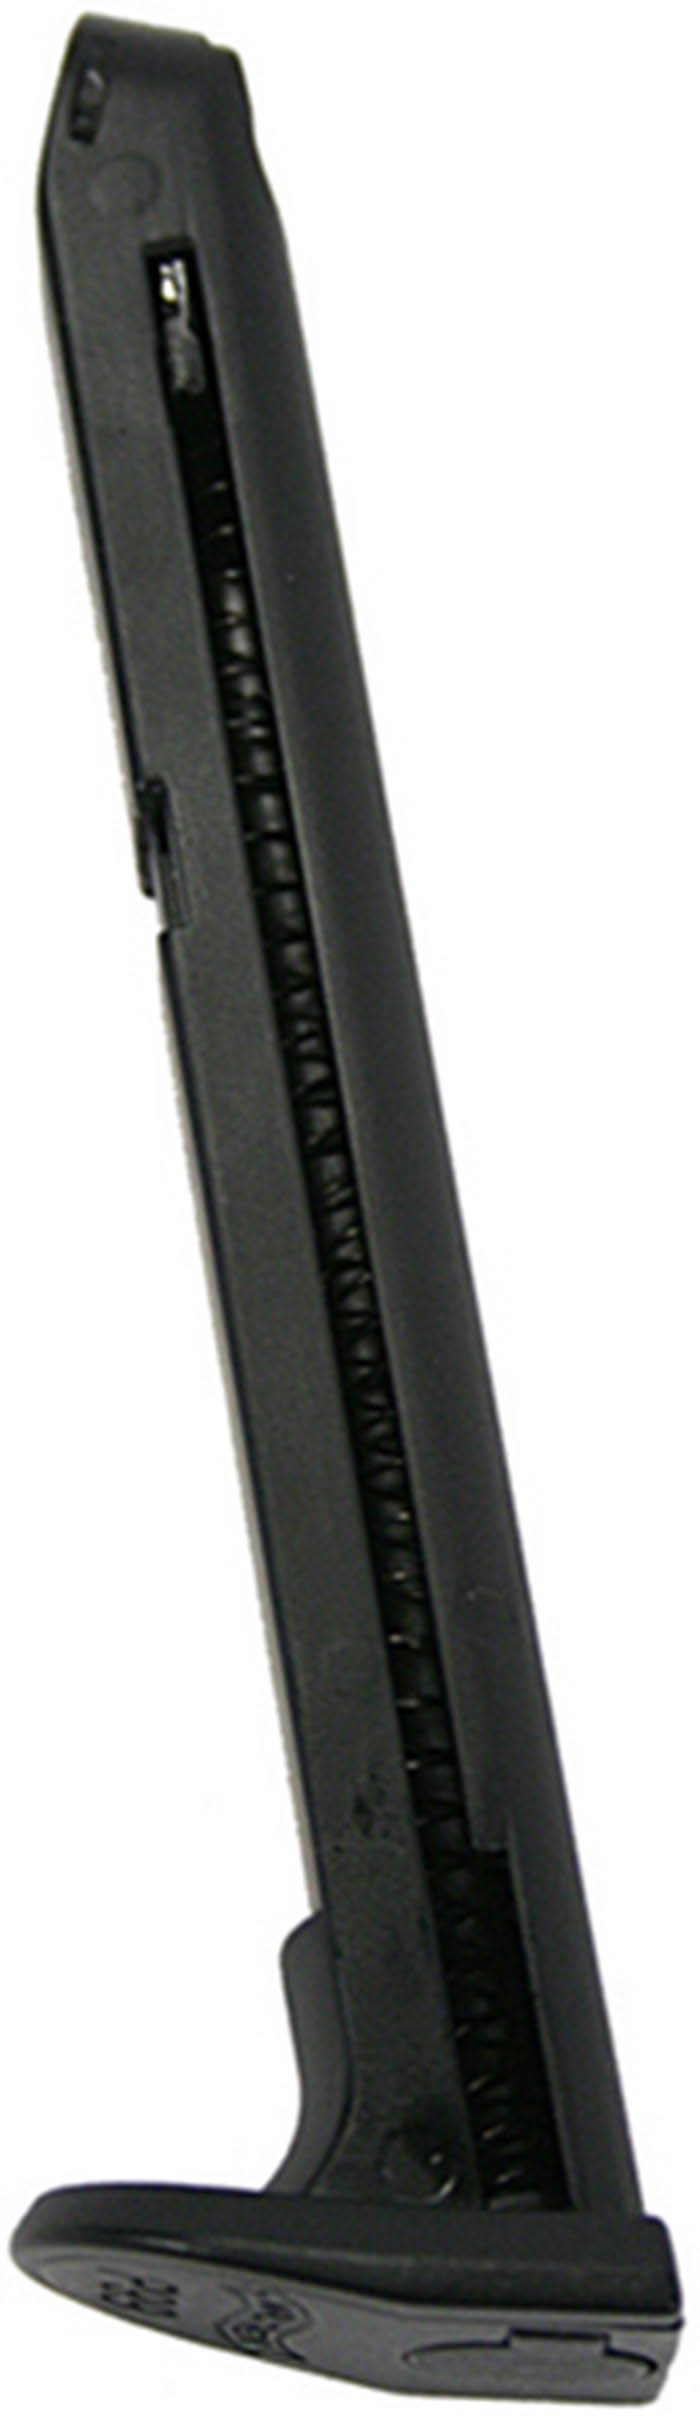 Walther Ram P99 Paintball Pistol Extra Magazine